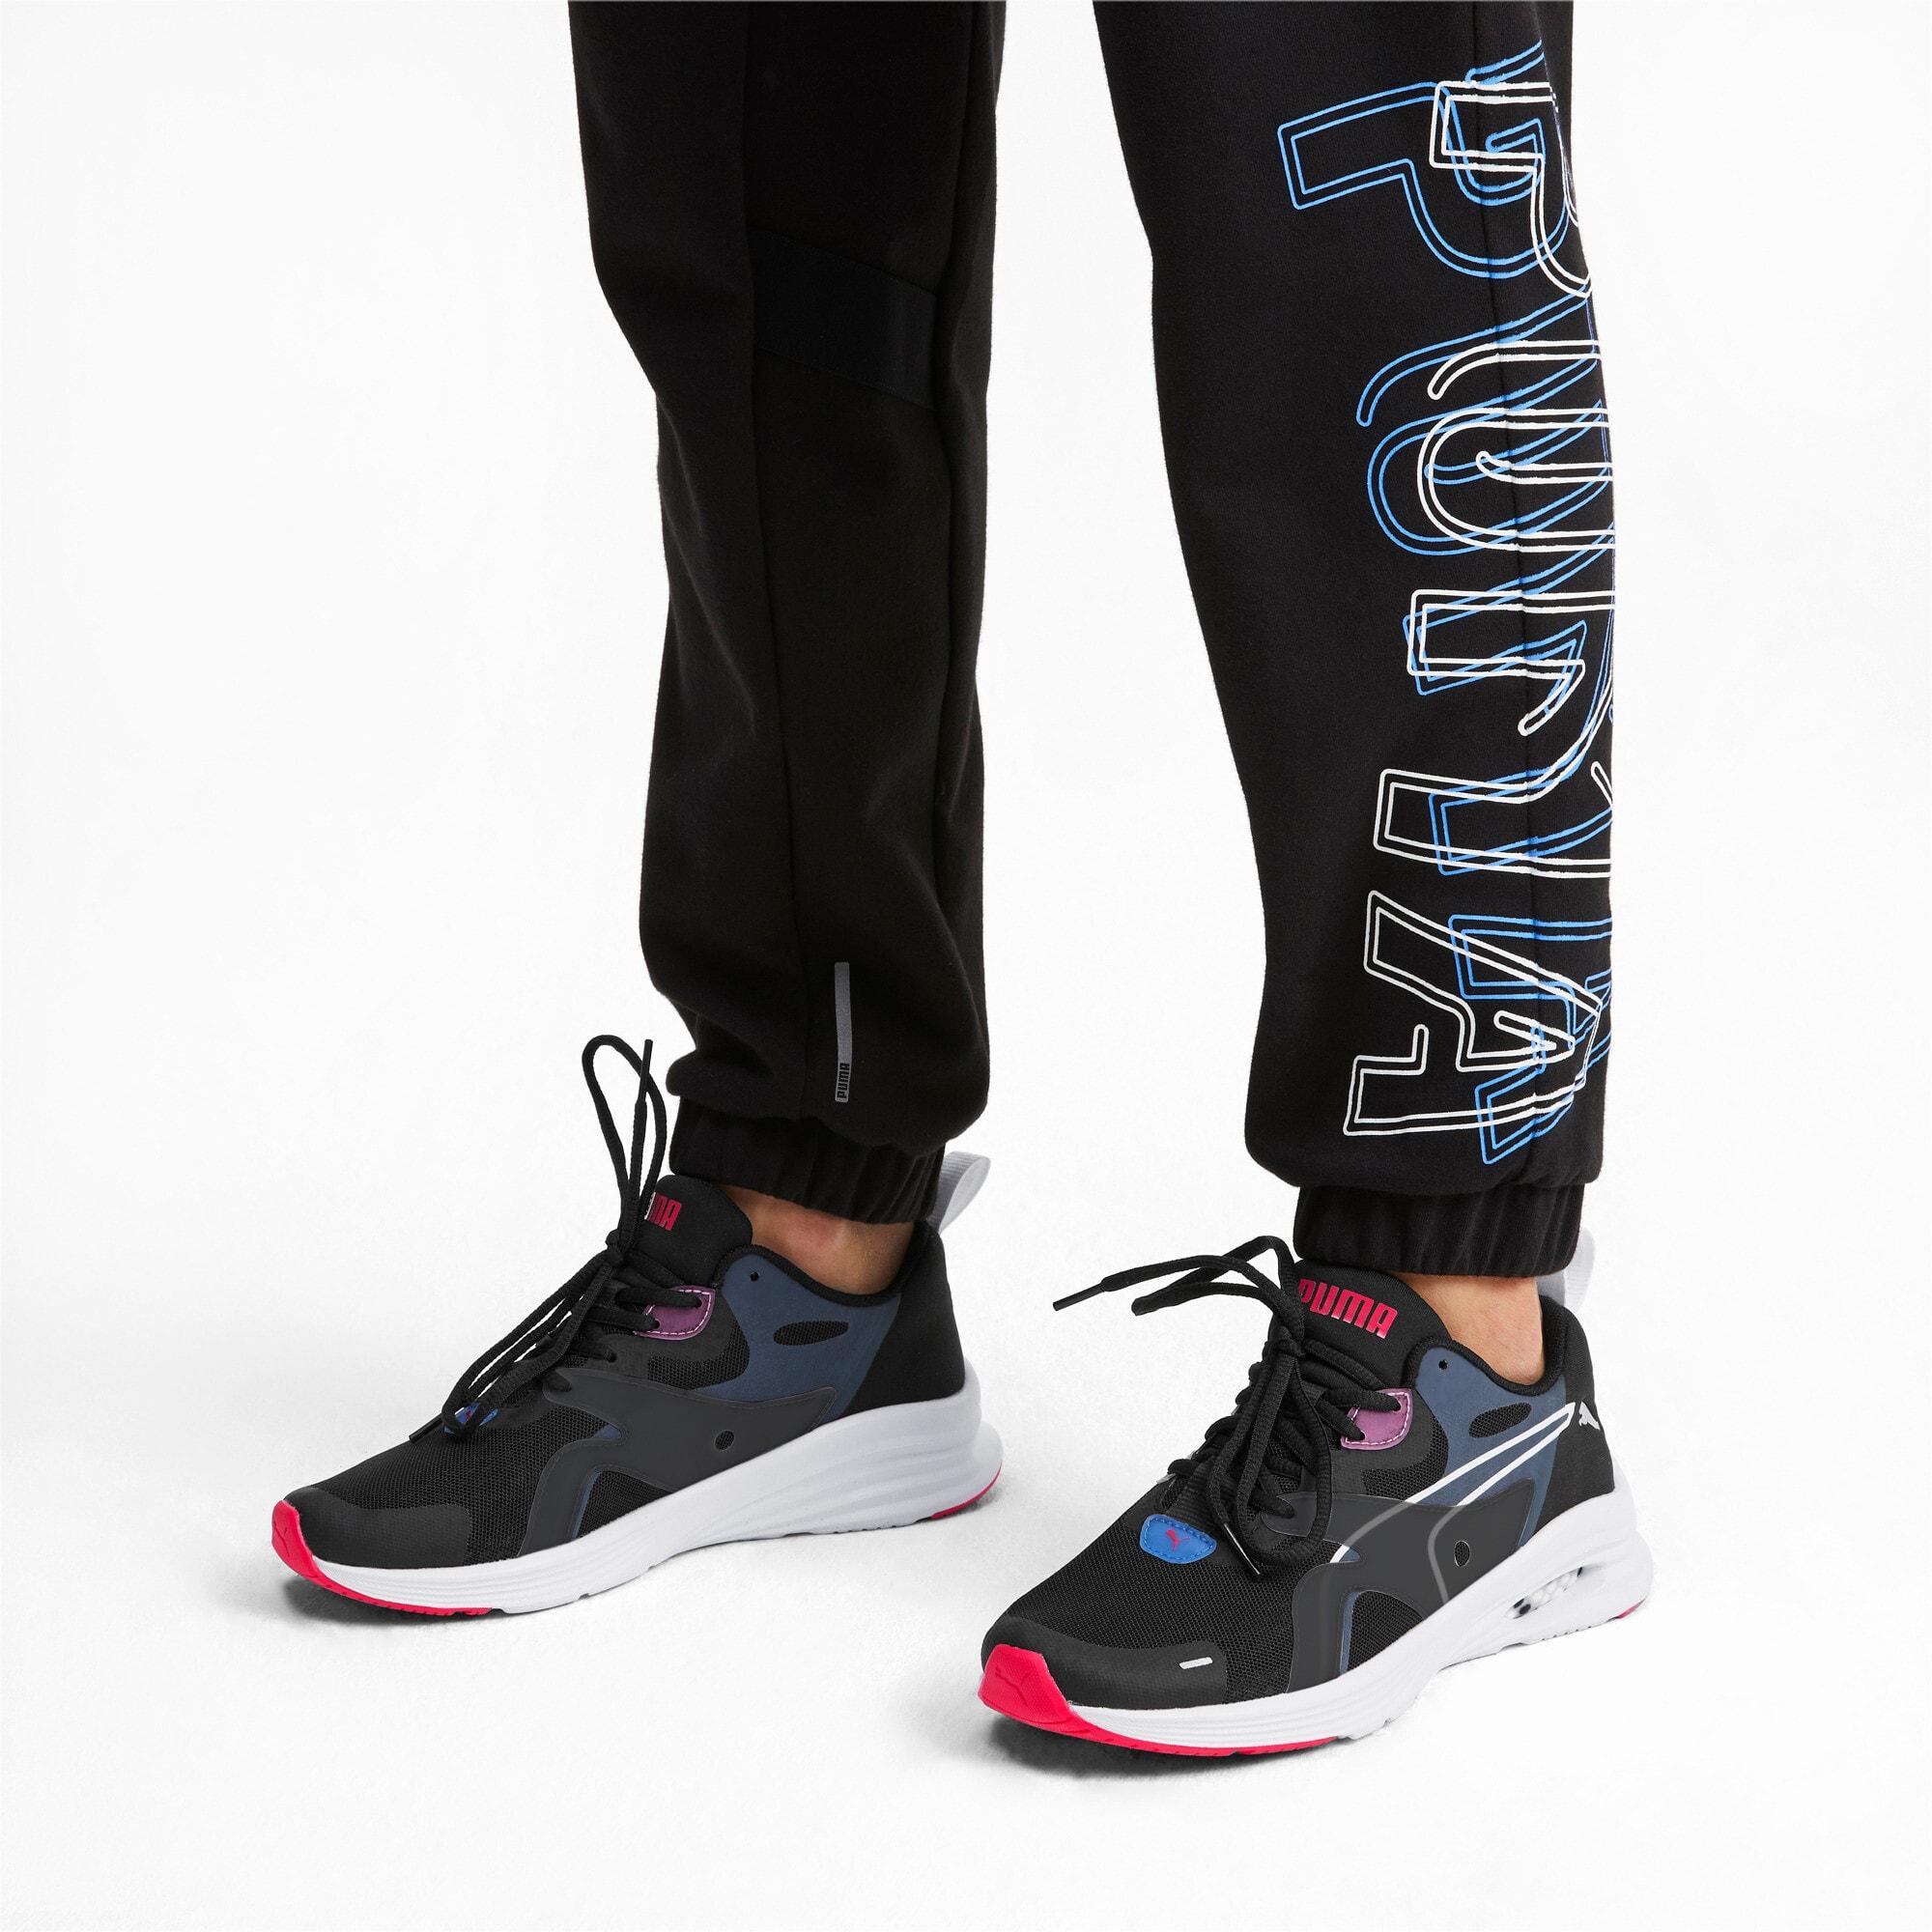 Thumbnail 2 of HYBRID Fuego Women's Running Shoes, Black-Blue Glimmer-Nrgy Rose, medium